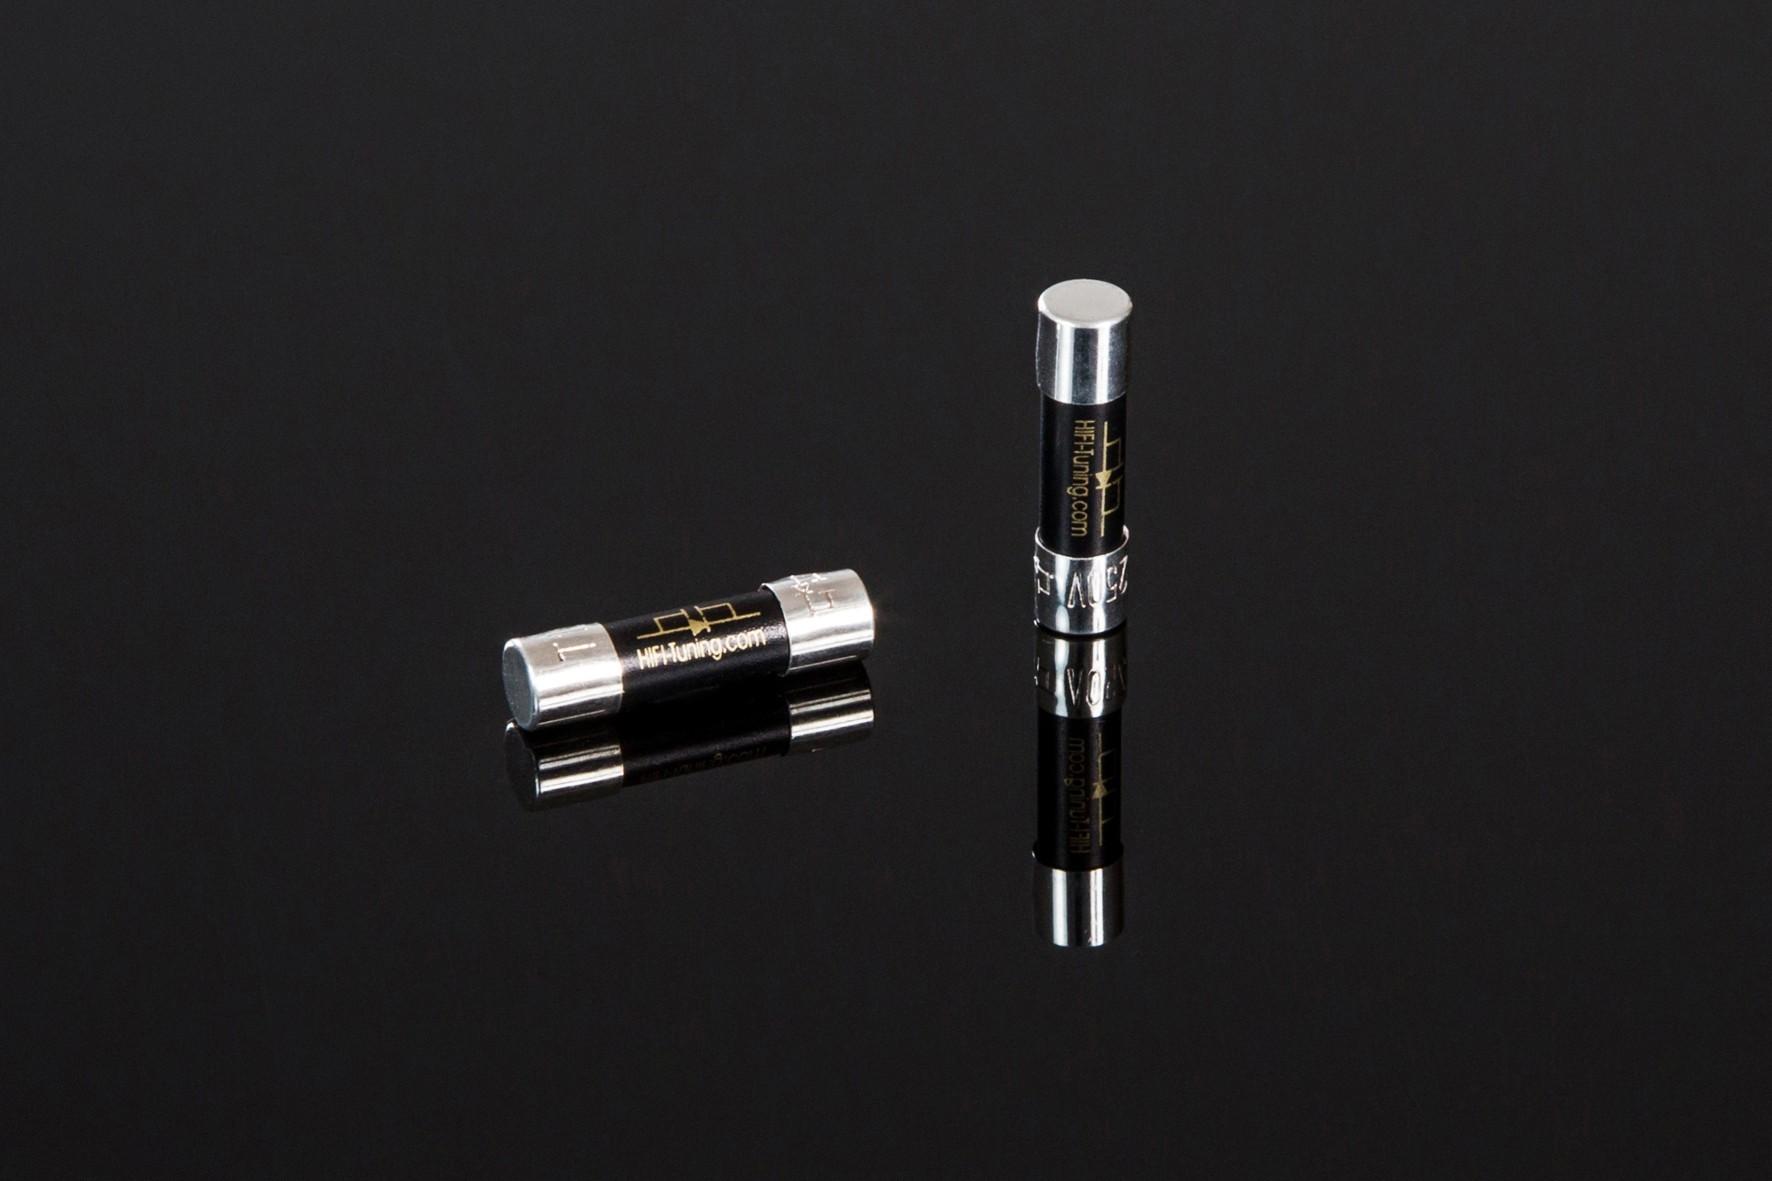 Surpreme3 [ F ]  1,25 Amp  5x20 mm  Silber Gold